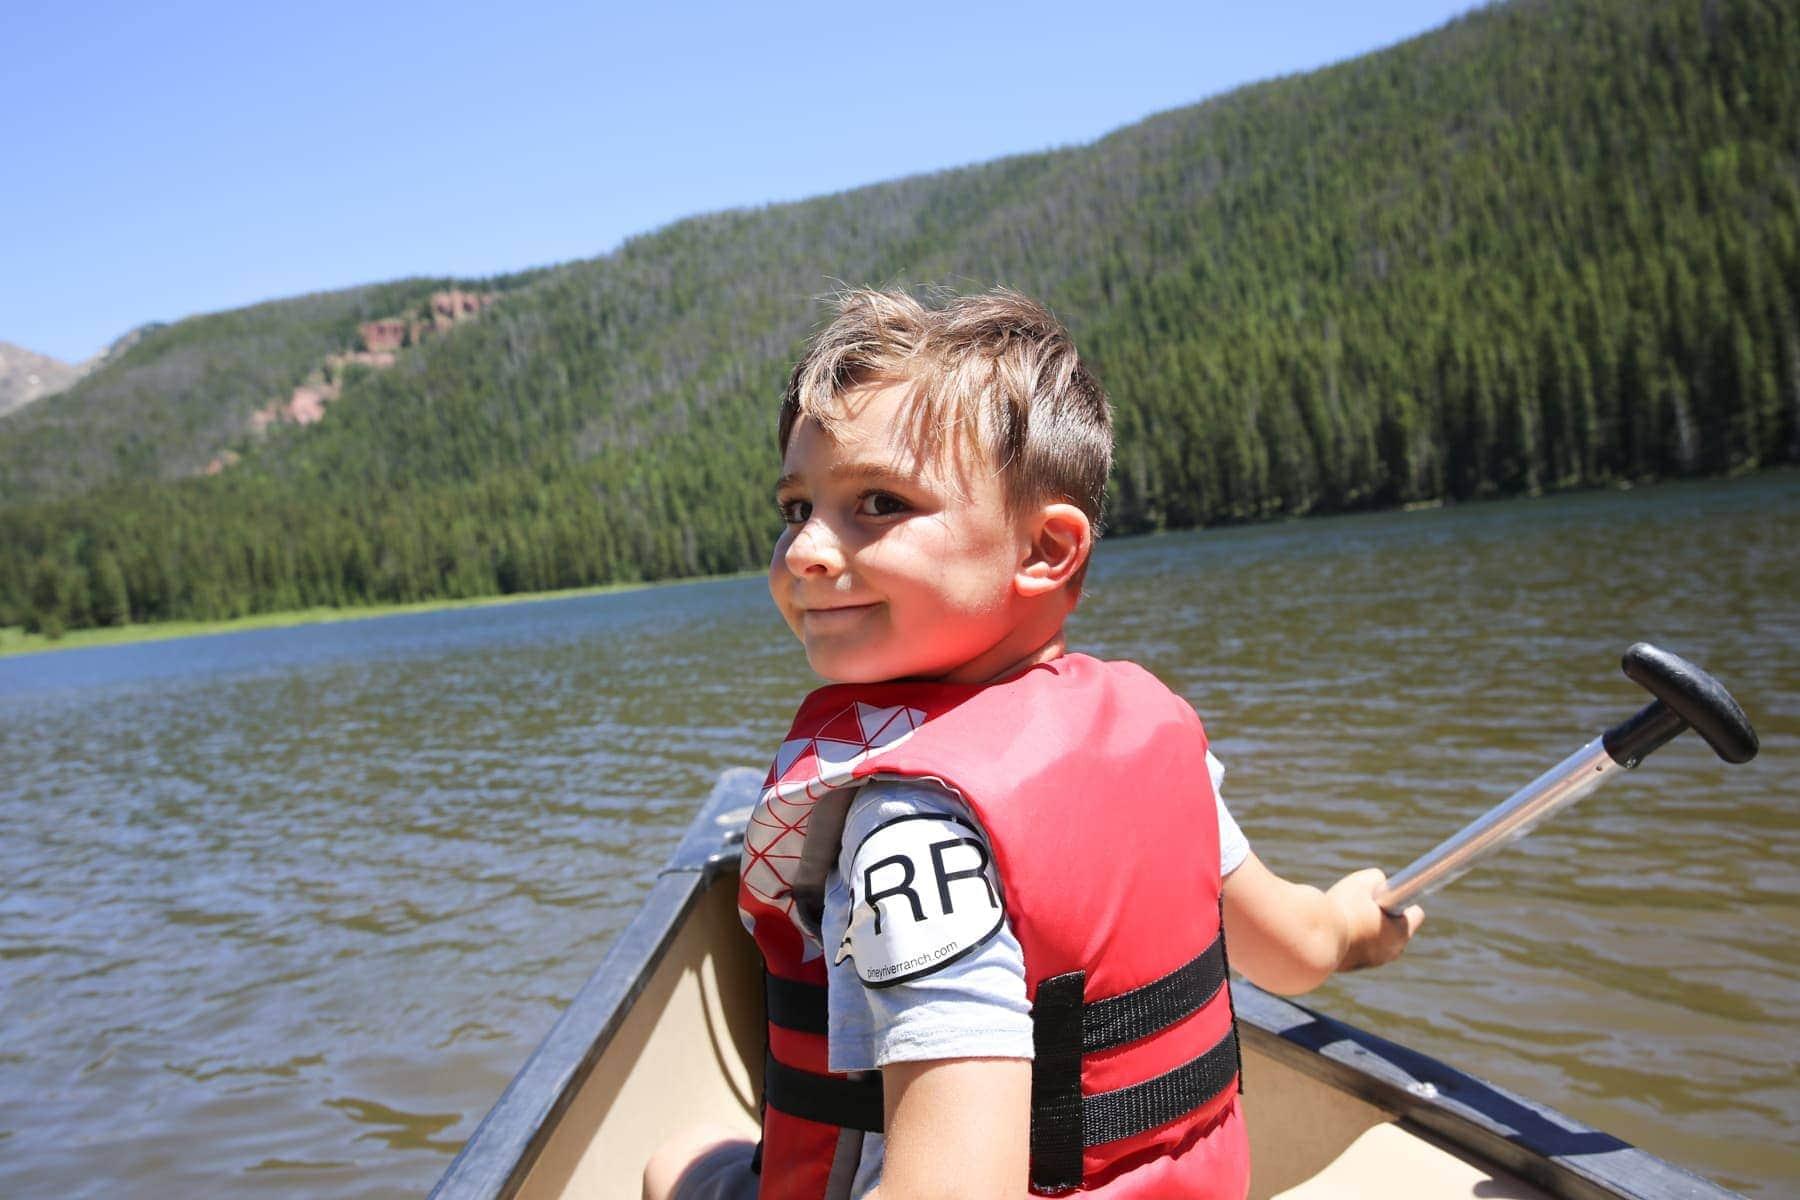 boy on canoe